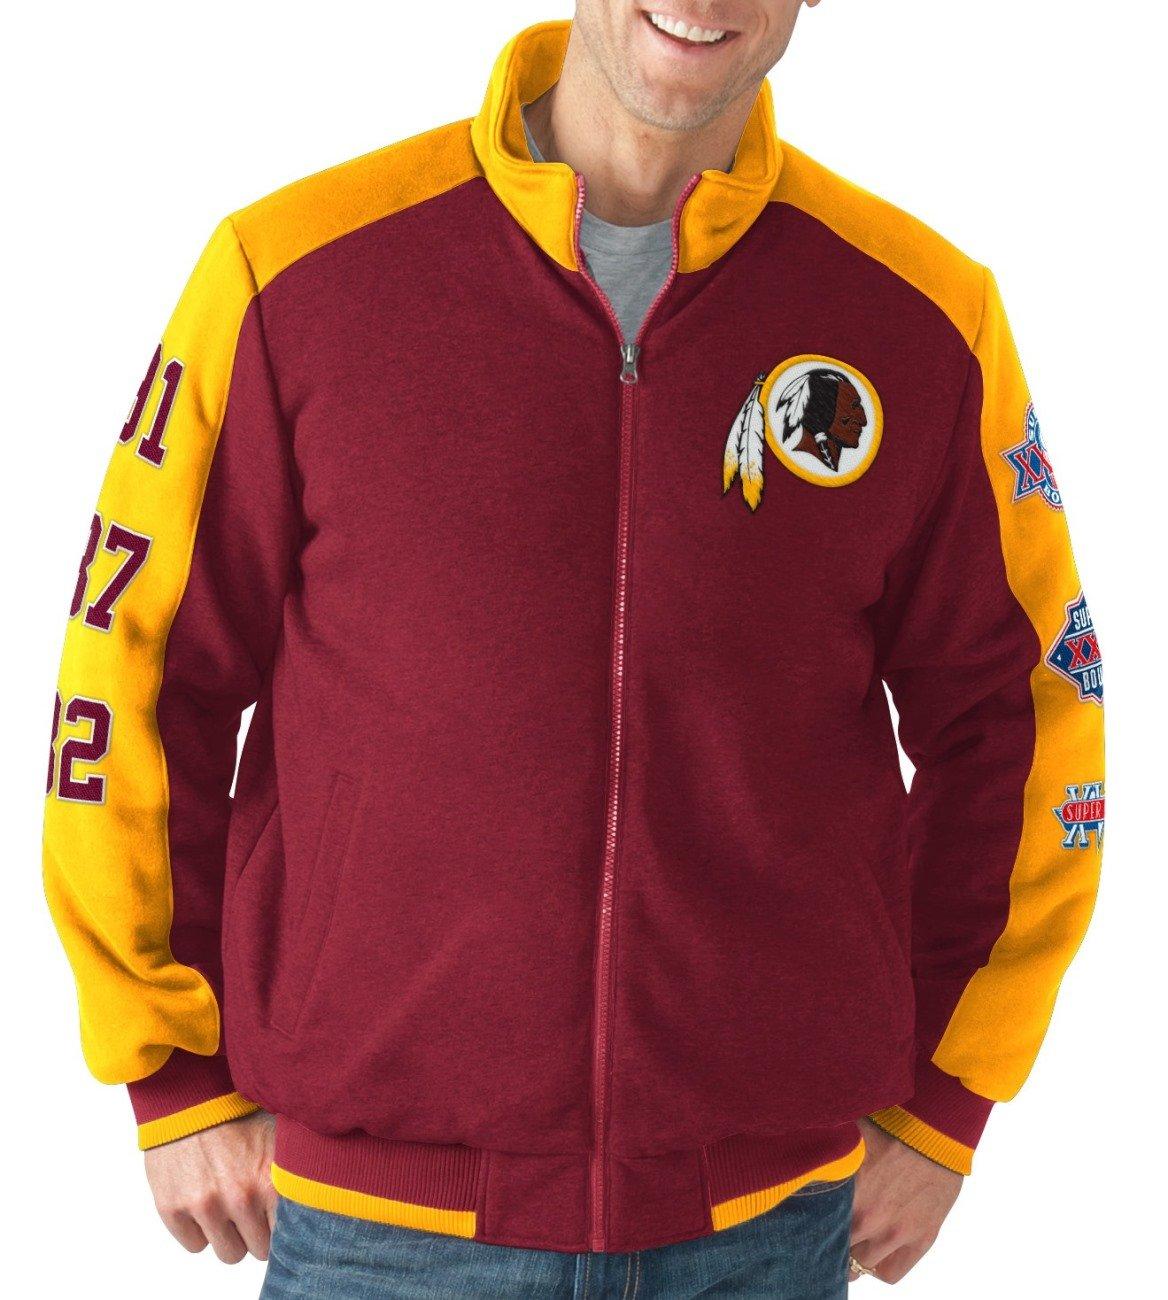 new concept 010b5 2fc13 G-III Sports Washington Redskins NFL Classic Men's Super Bowl Commemorative  Varsity Jacket